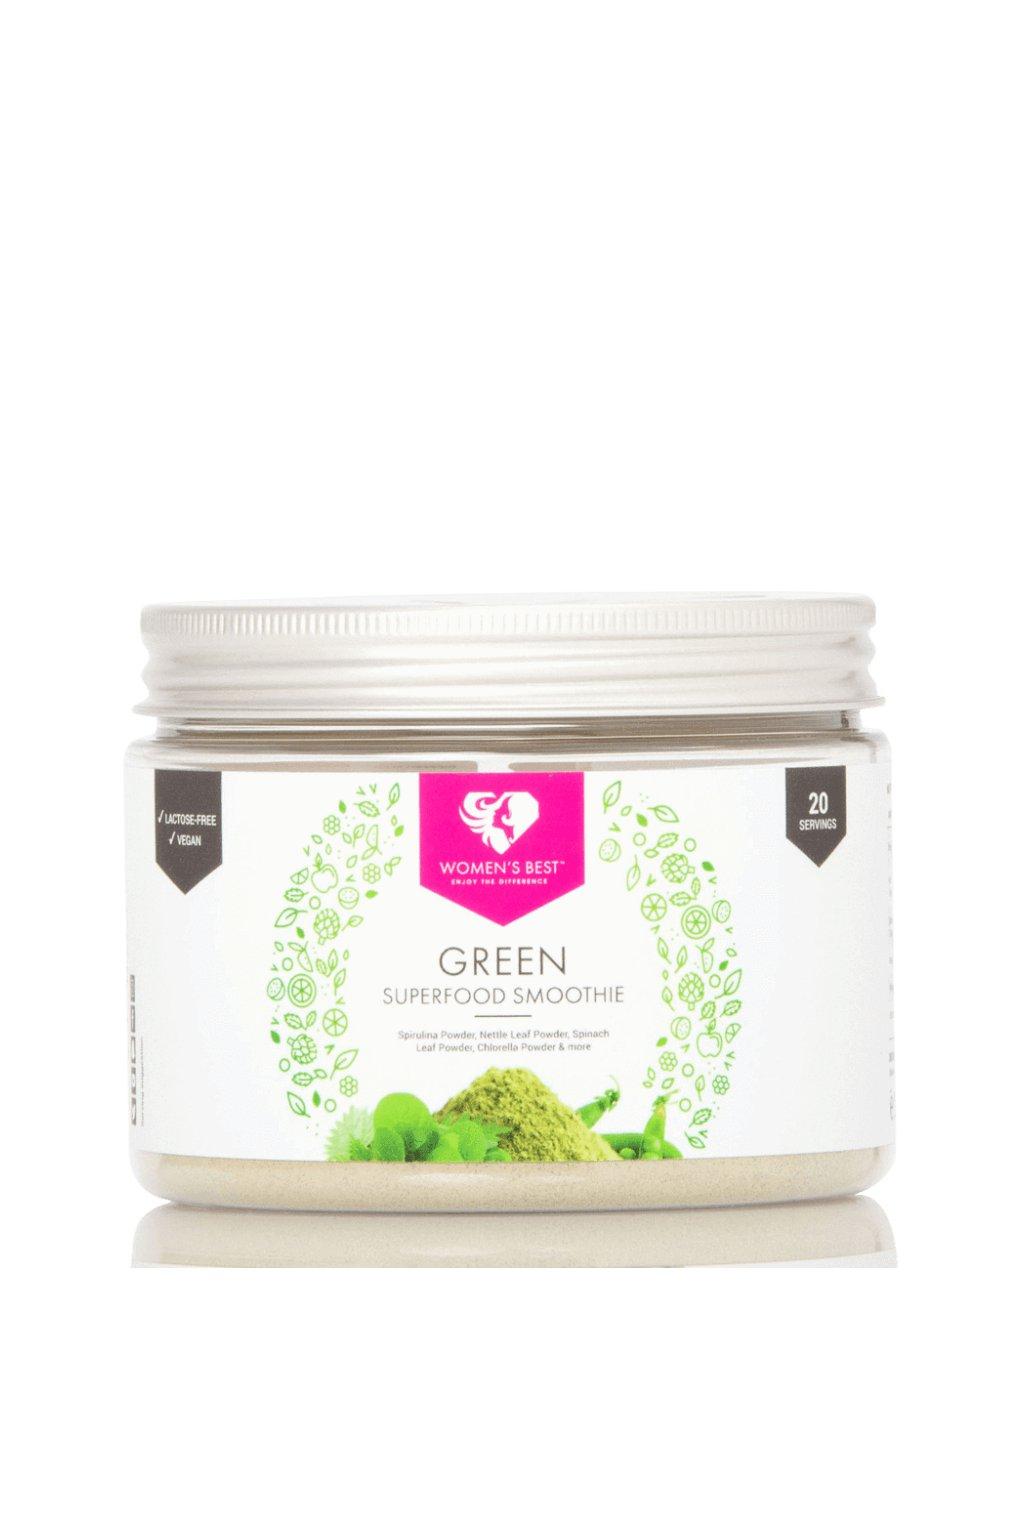 Women´s Best Green Superfood Smoothie 200g